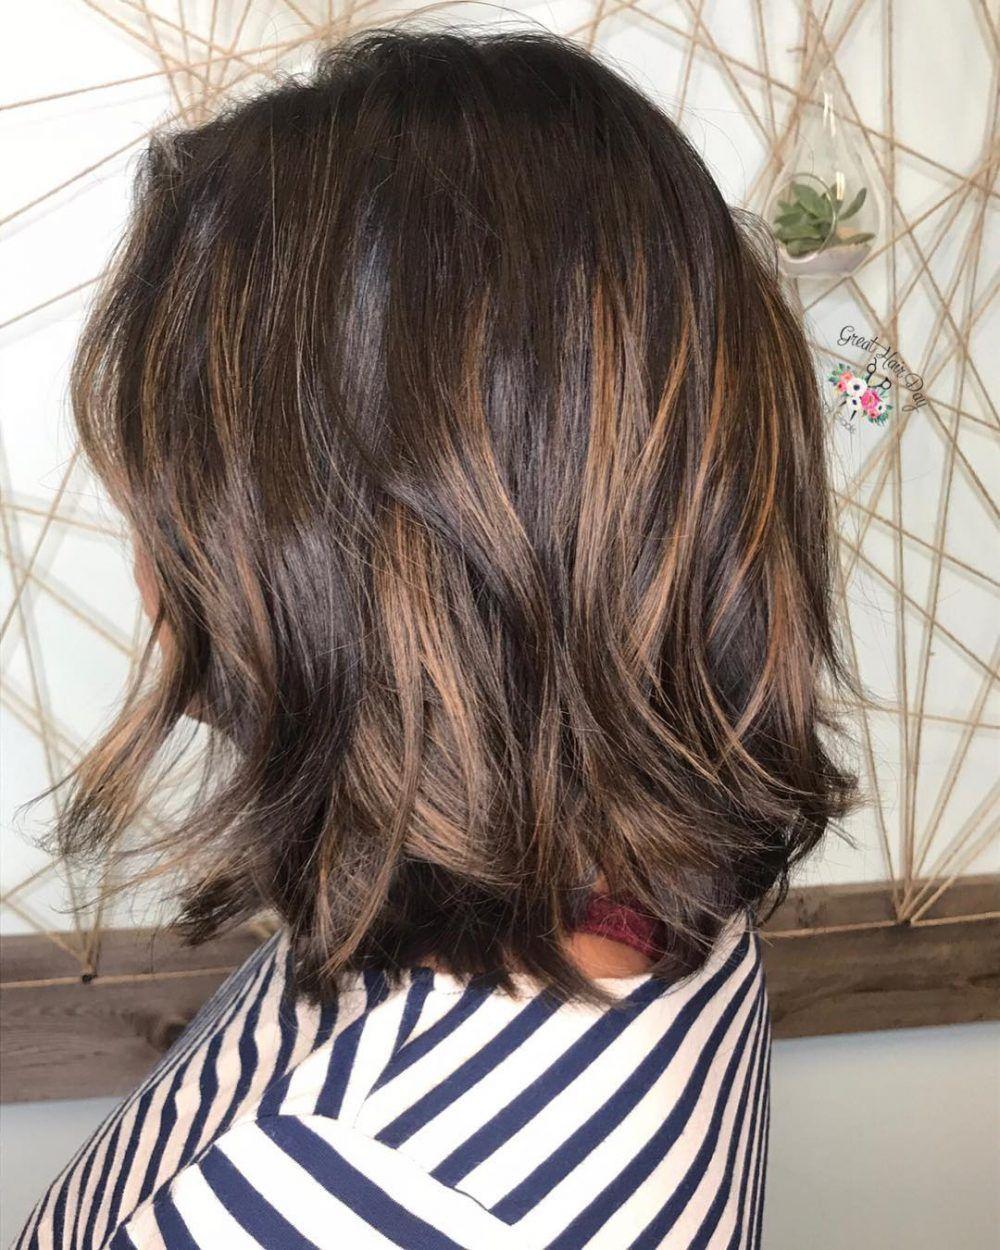 34 Sweetest Caramel Highlights On Light Dark Brown Hair Highlights For Dark Brown Hair Brown Hair With Caramel Highlights Hair Highlights